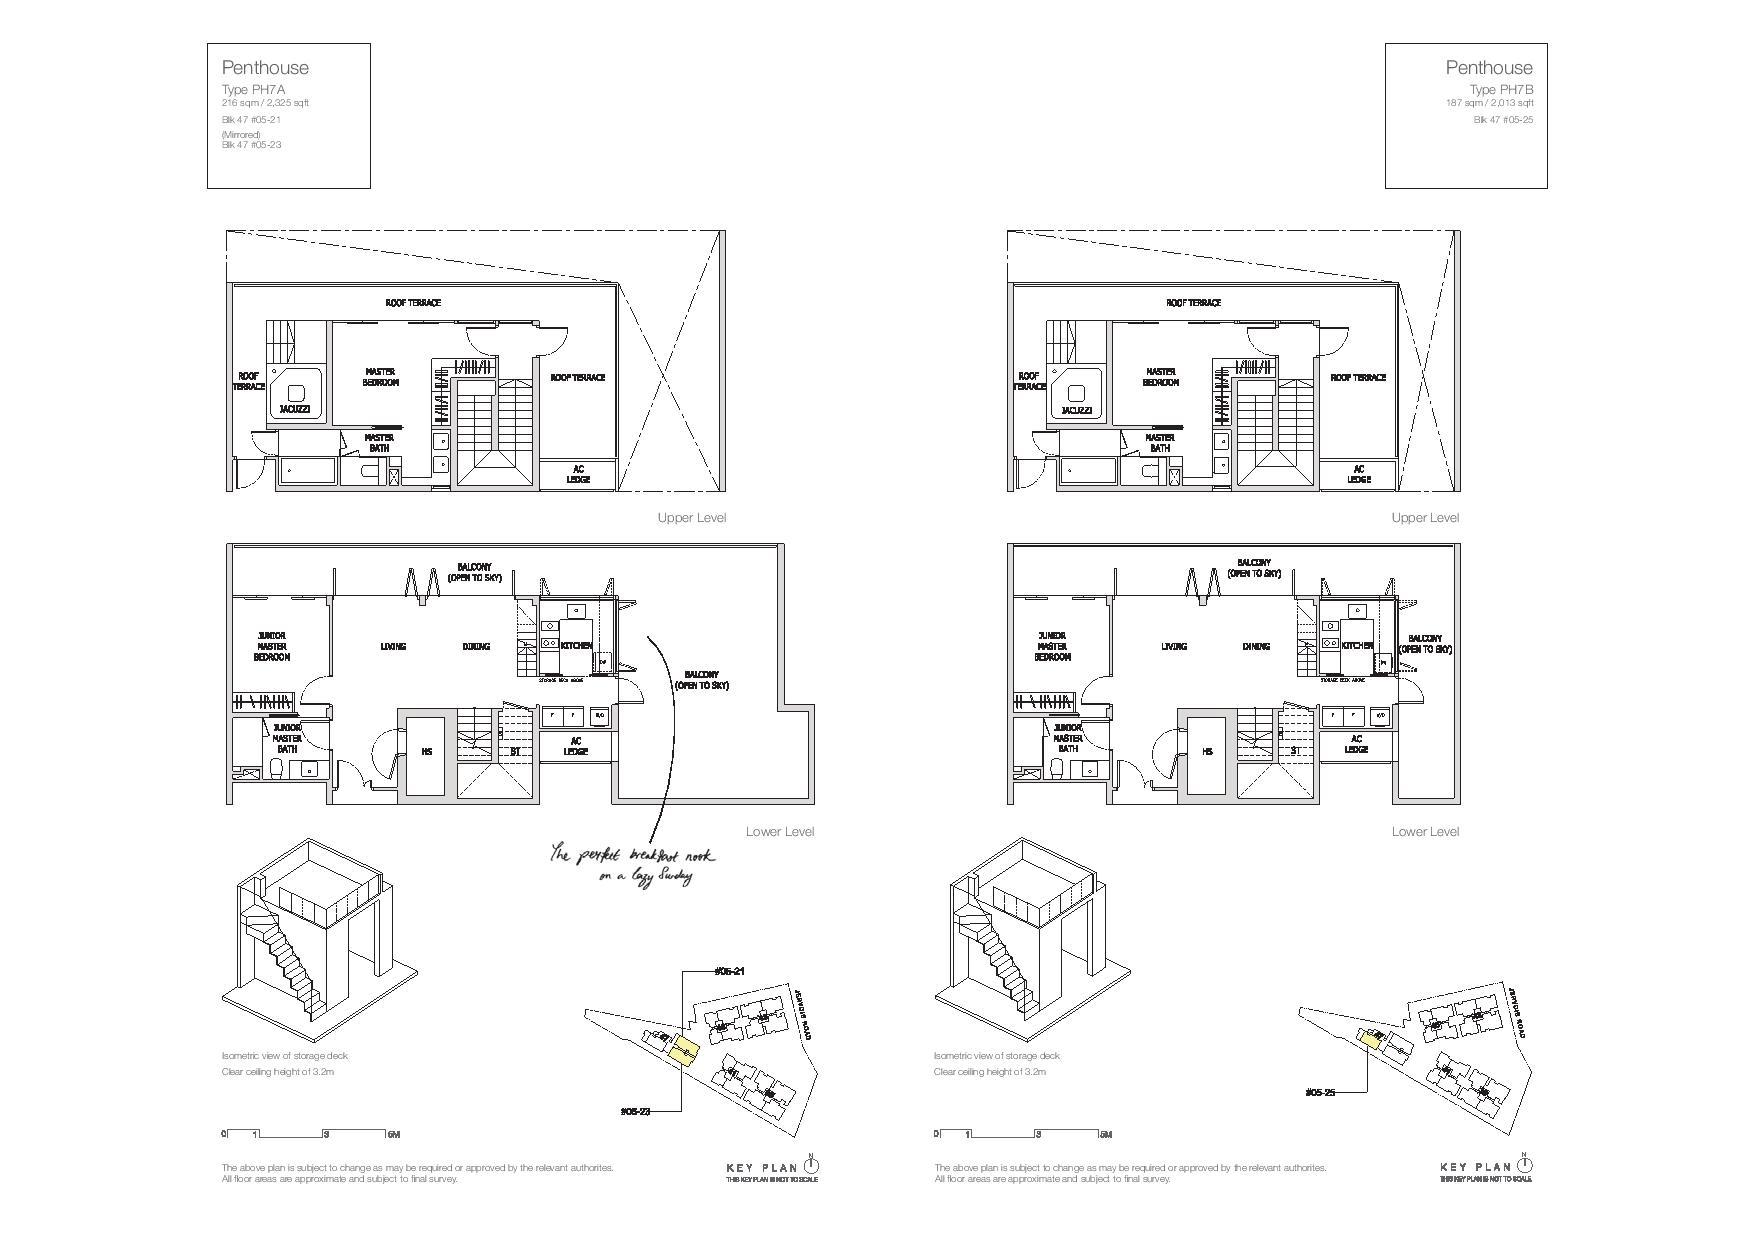 Mon Jervois Penthouse Floor Plans Type PH7A, PH7B